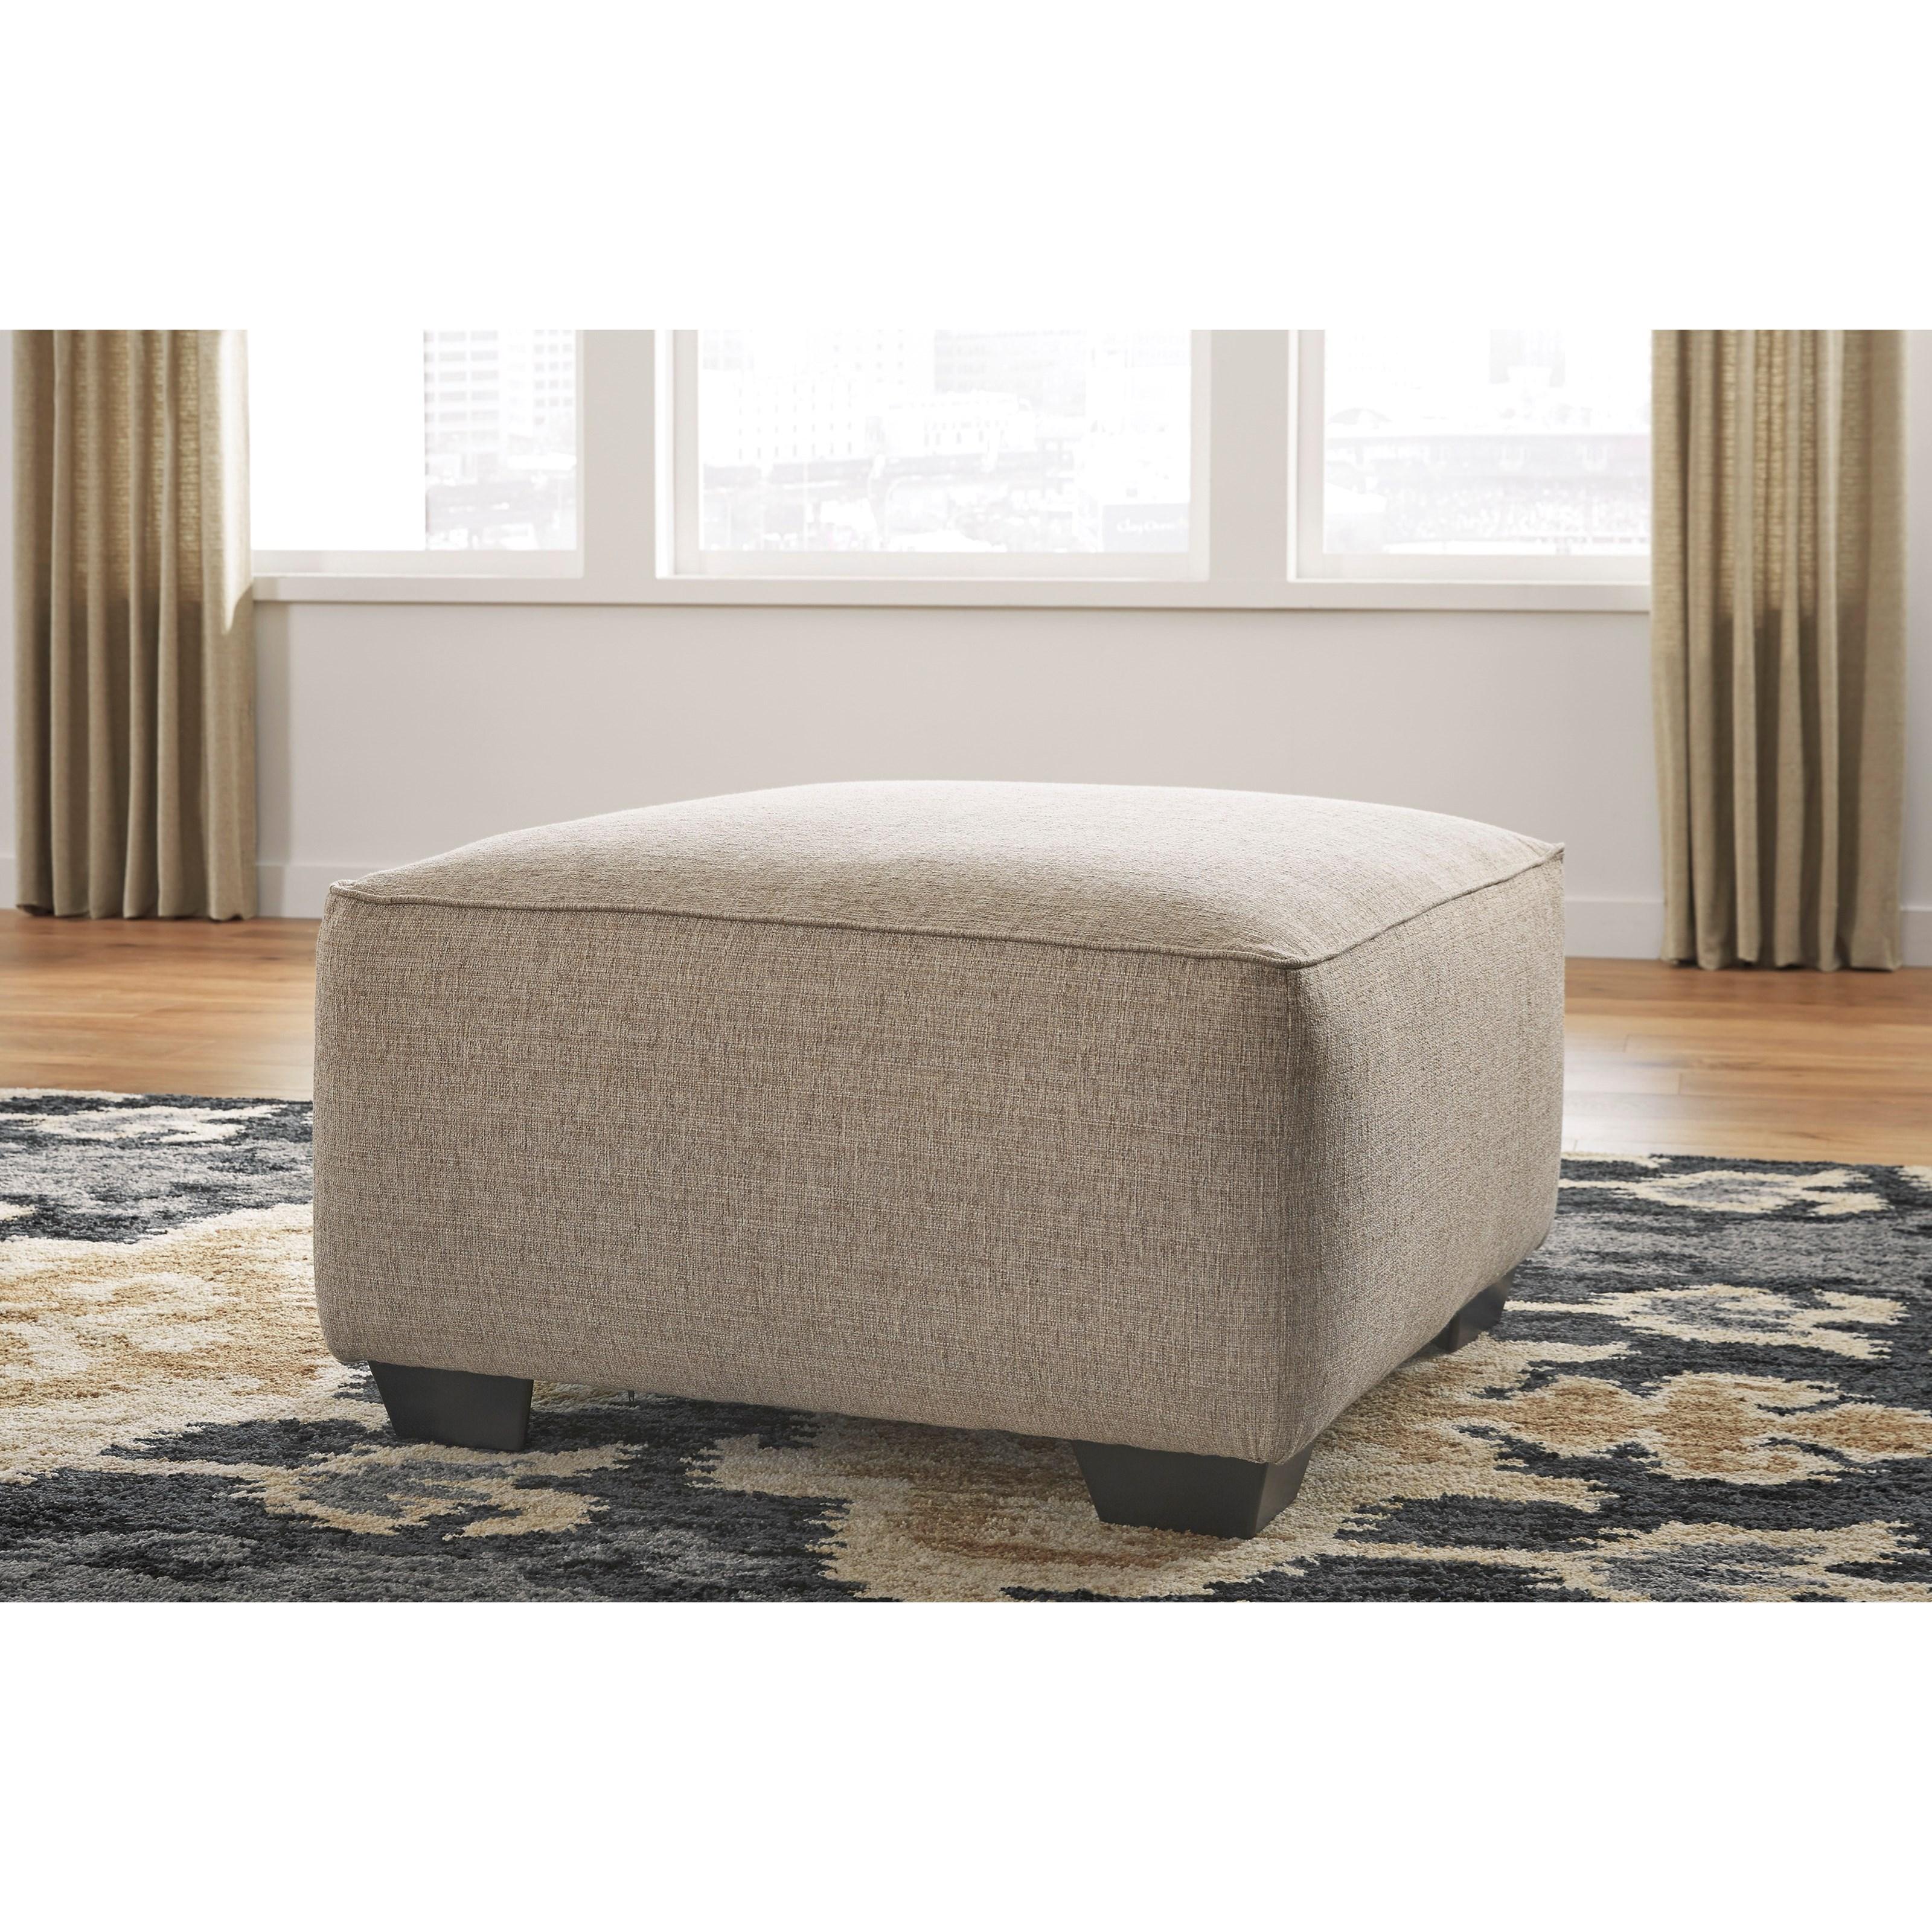 Ashley Furniture Baceno 8120208 Oversized Accent Ottoman